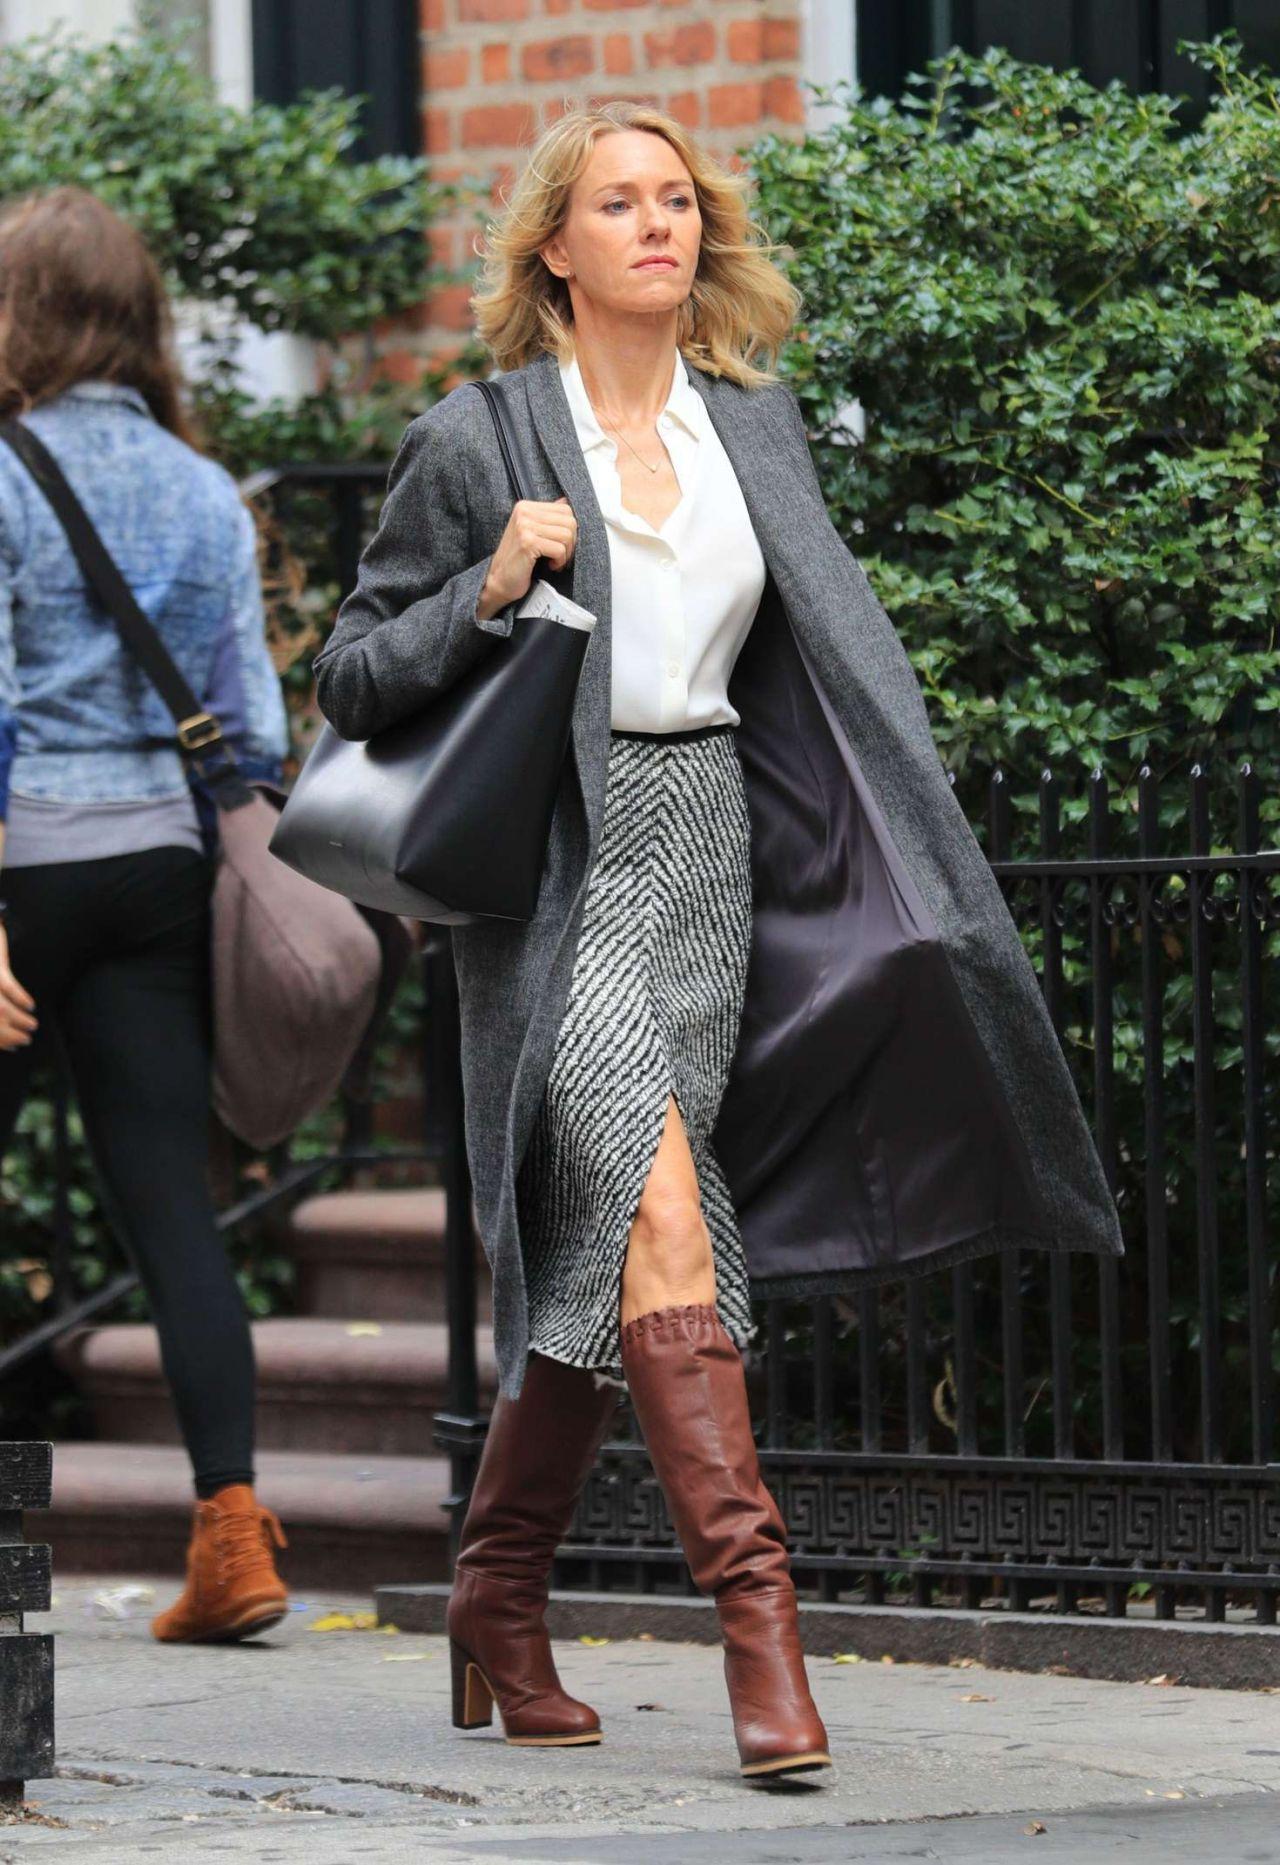 Naomi Watts Style and Fashion Inspirations - NYC 9/28/2016